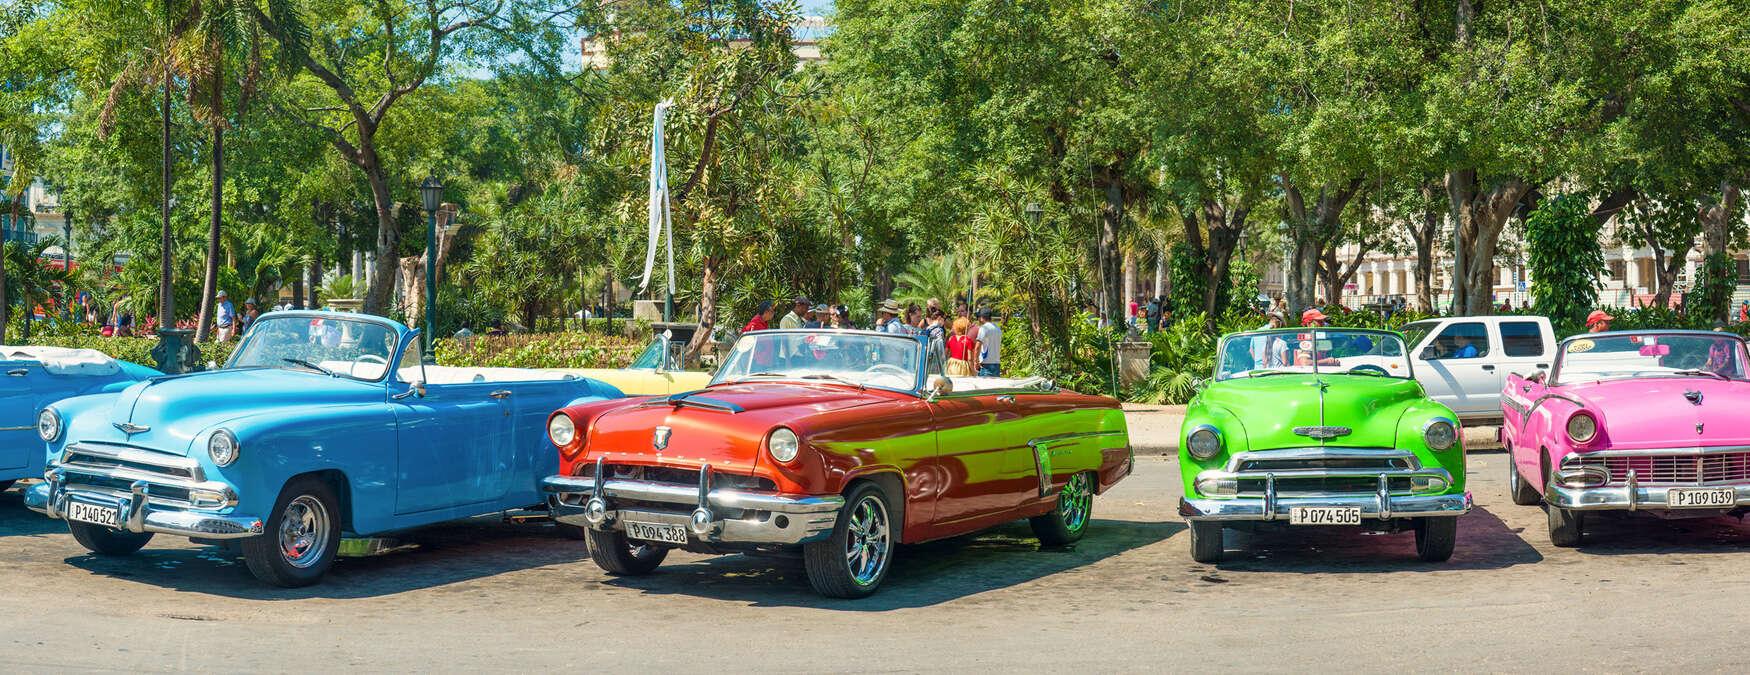 classic-cars-havana.jpg